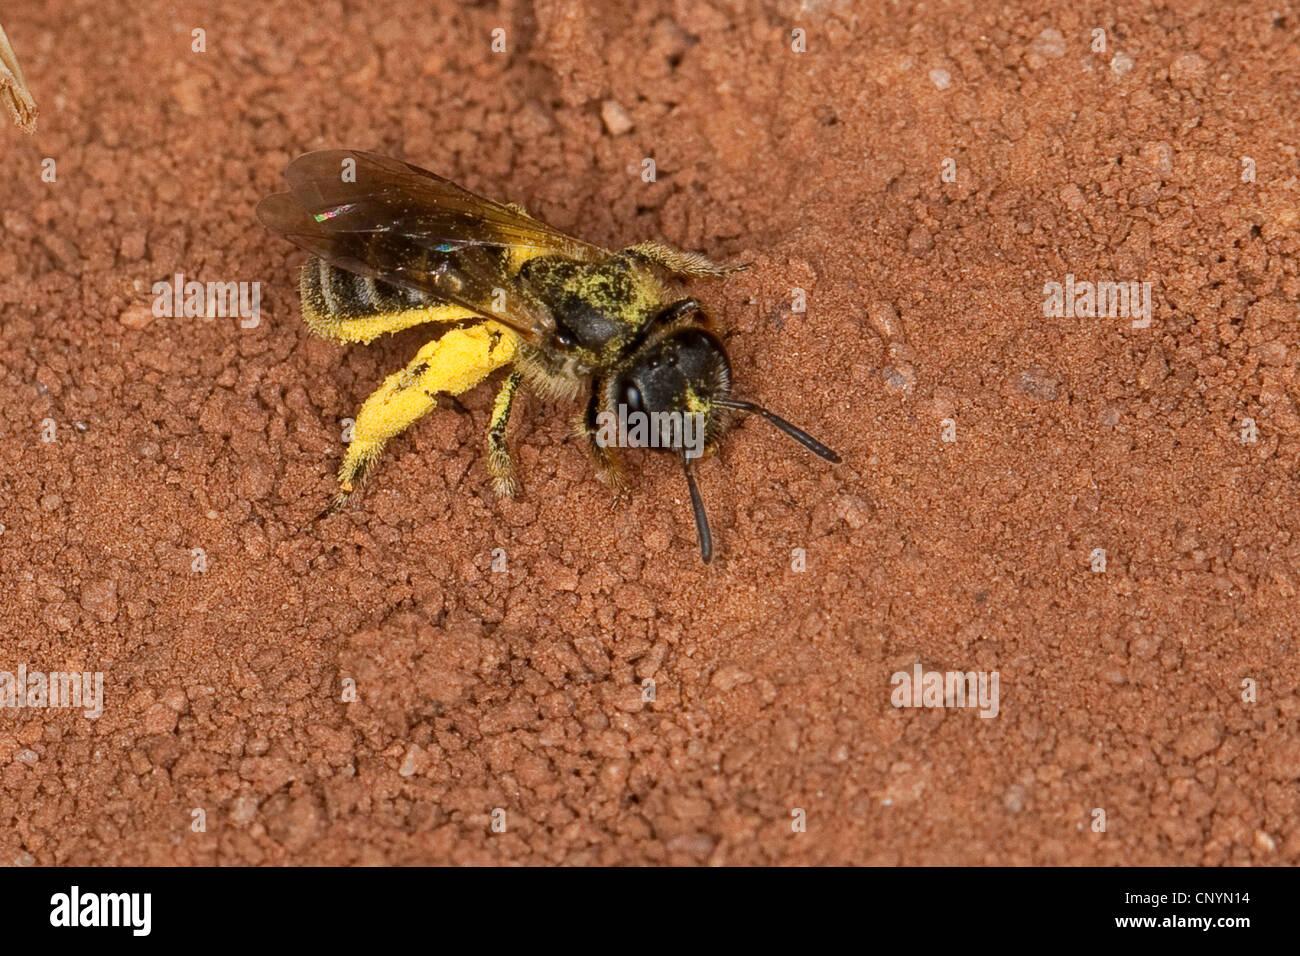 Sweat bee, European halictid bee (Lasioglossum spec. ), sitting on the ground, Germany - Stock Image